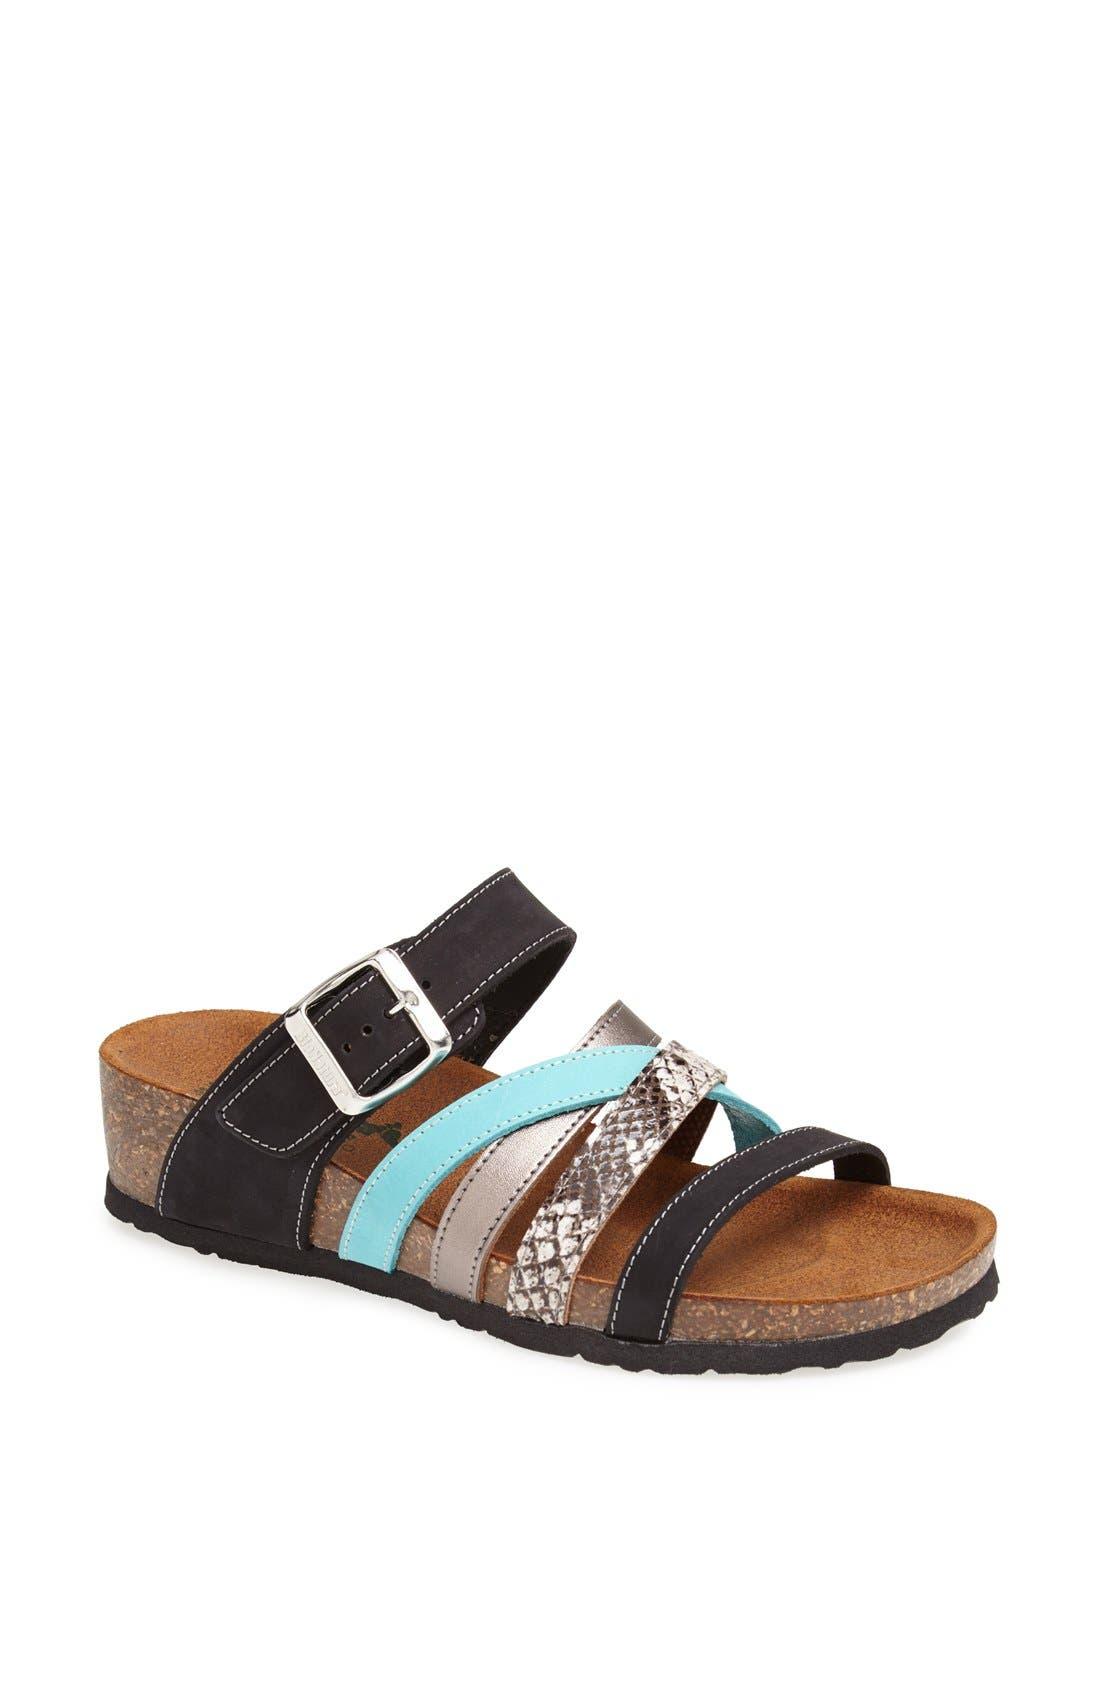 Alternate Image 1 Selected - BioNatura 'Nutmeg' Sandal